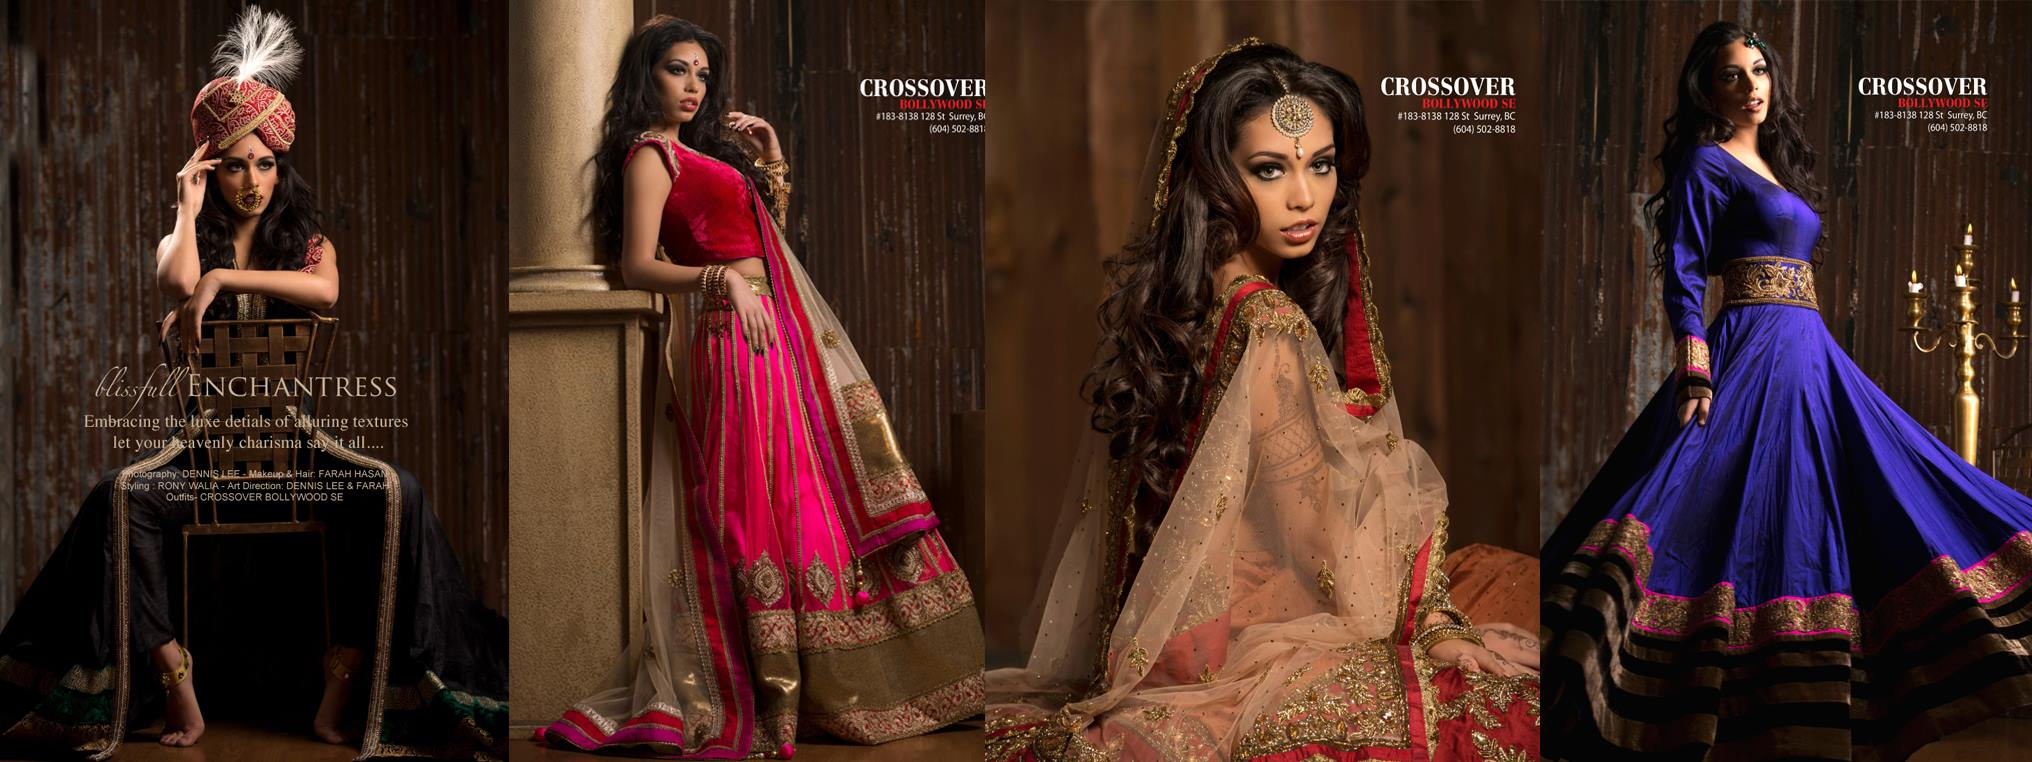 Crossover Bollywood Se